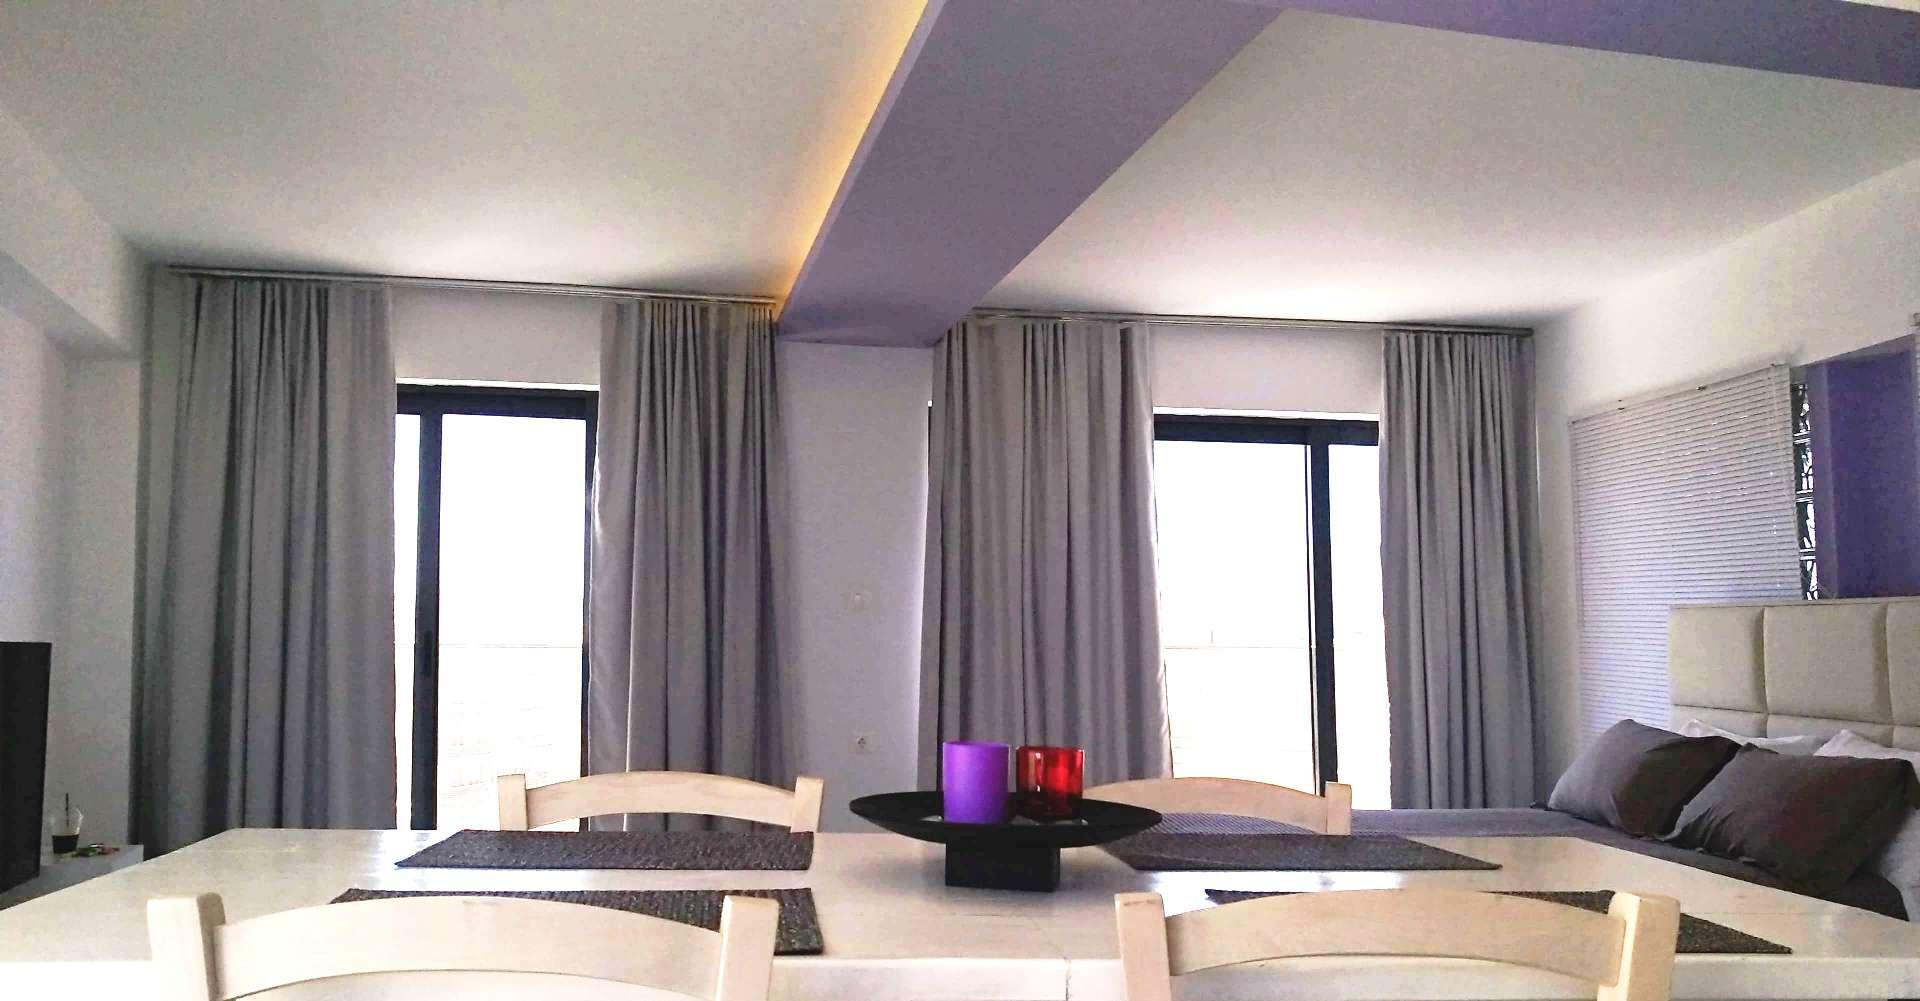 Marnin rhodes apartments